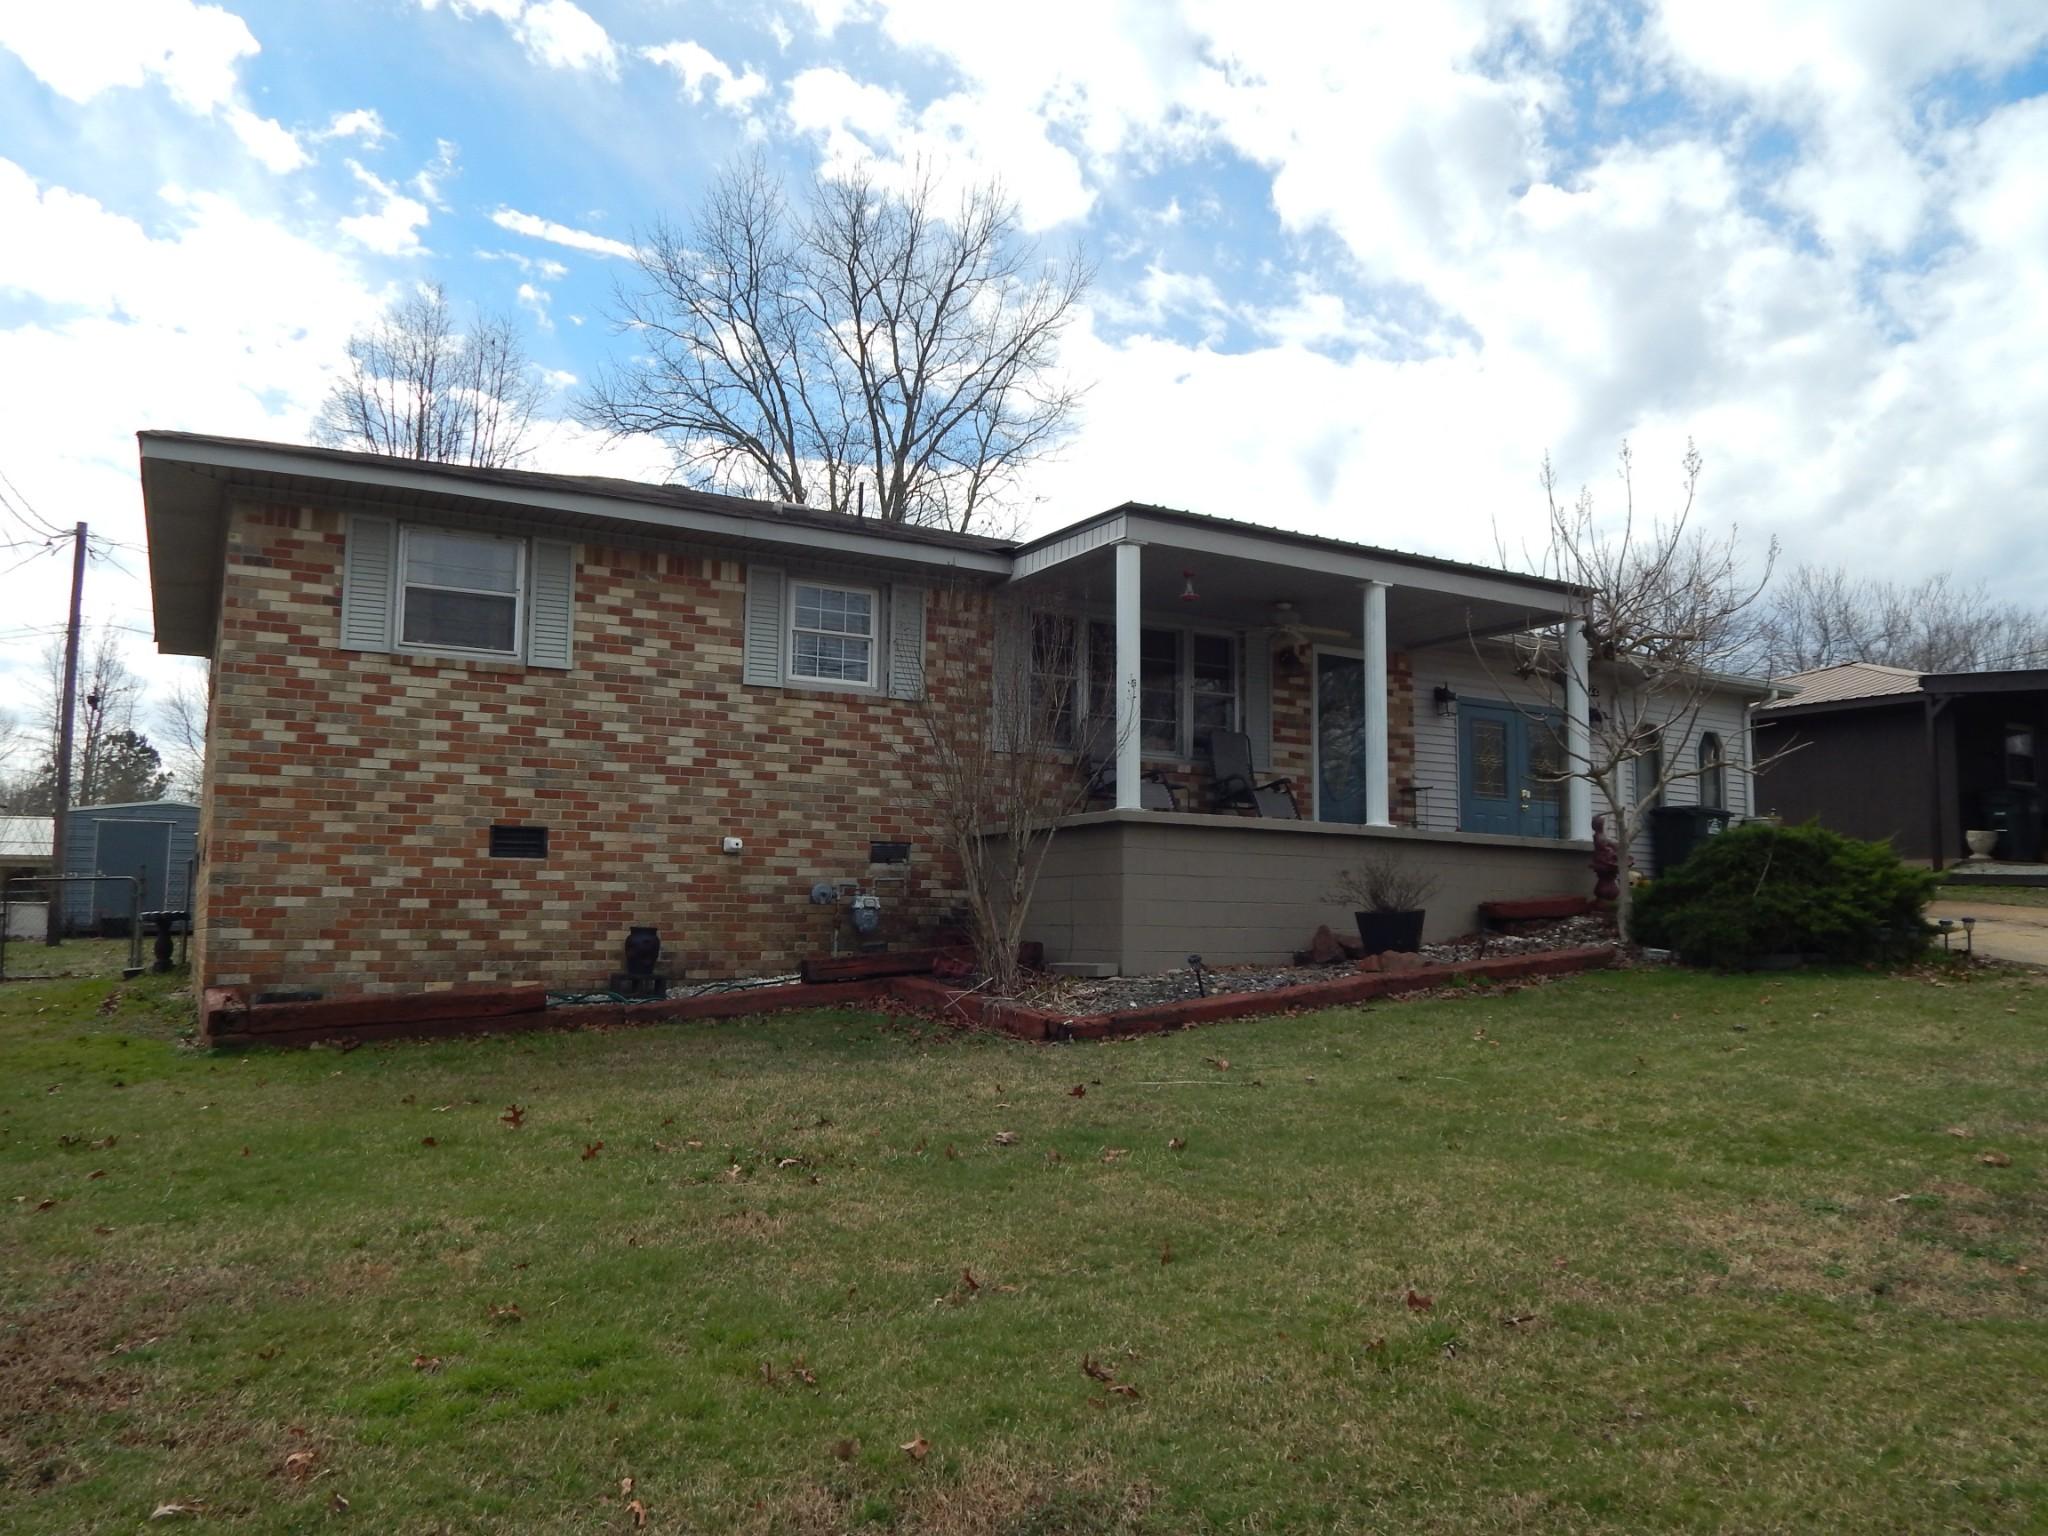 122 E Dixon St Property Photo - Collinwood, TN real estate listing